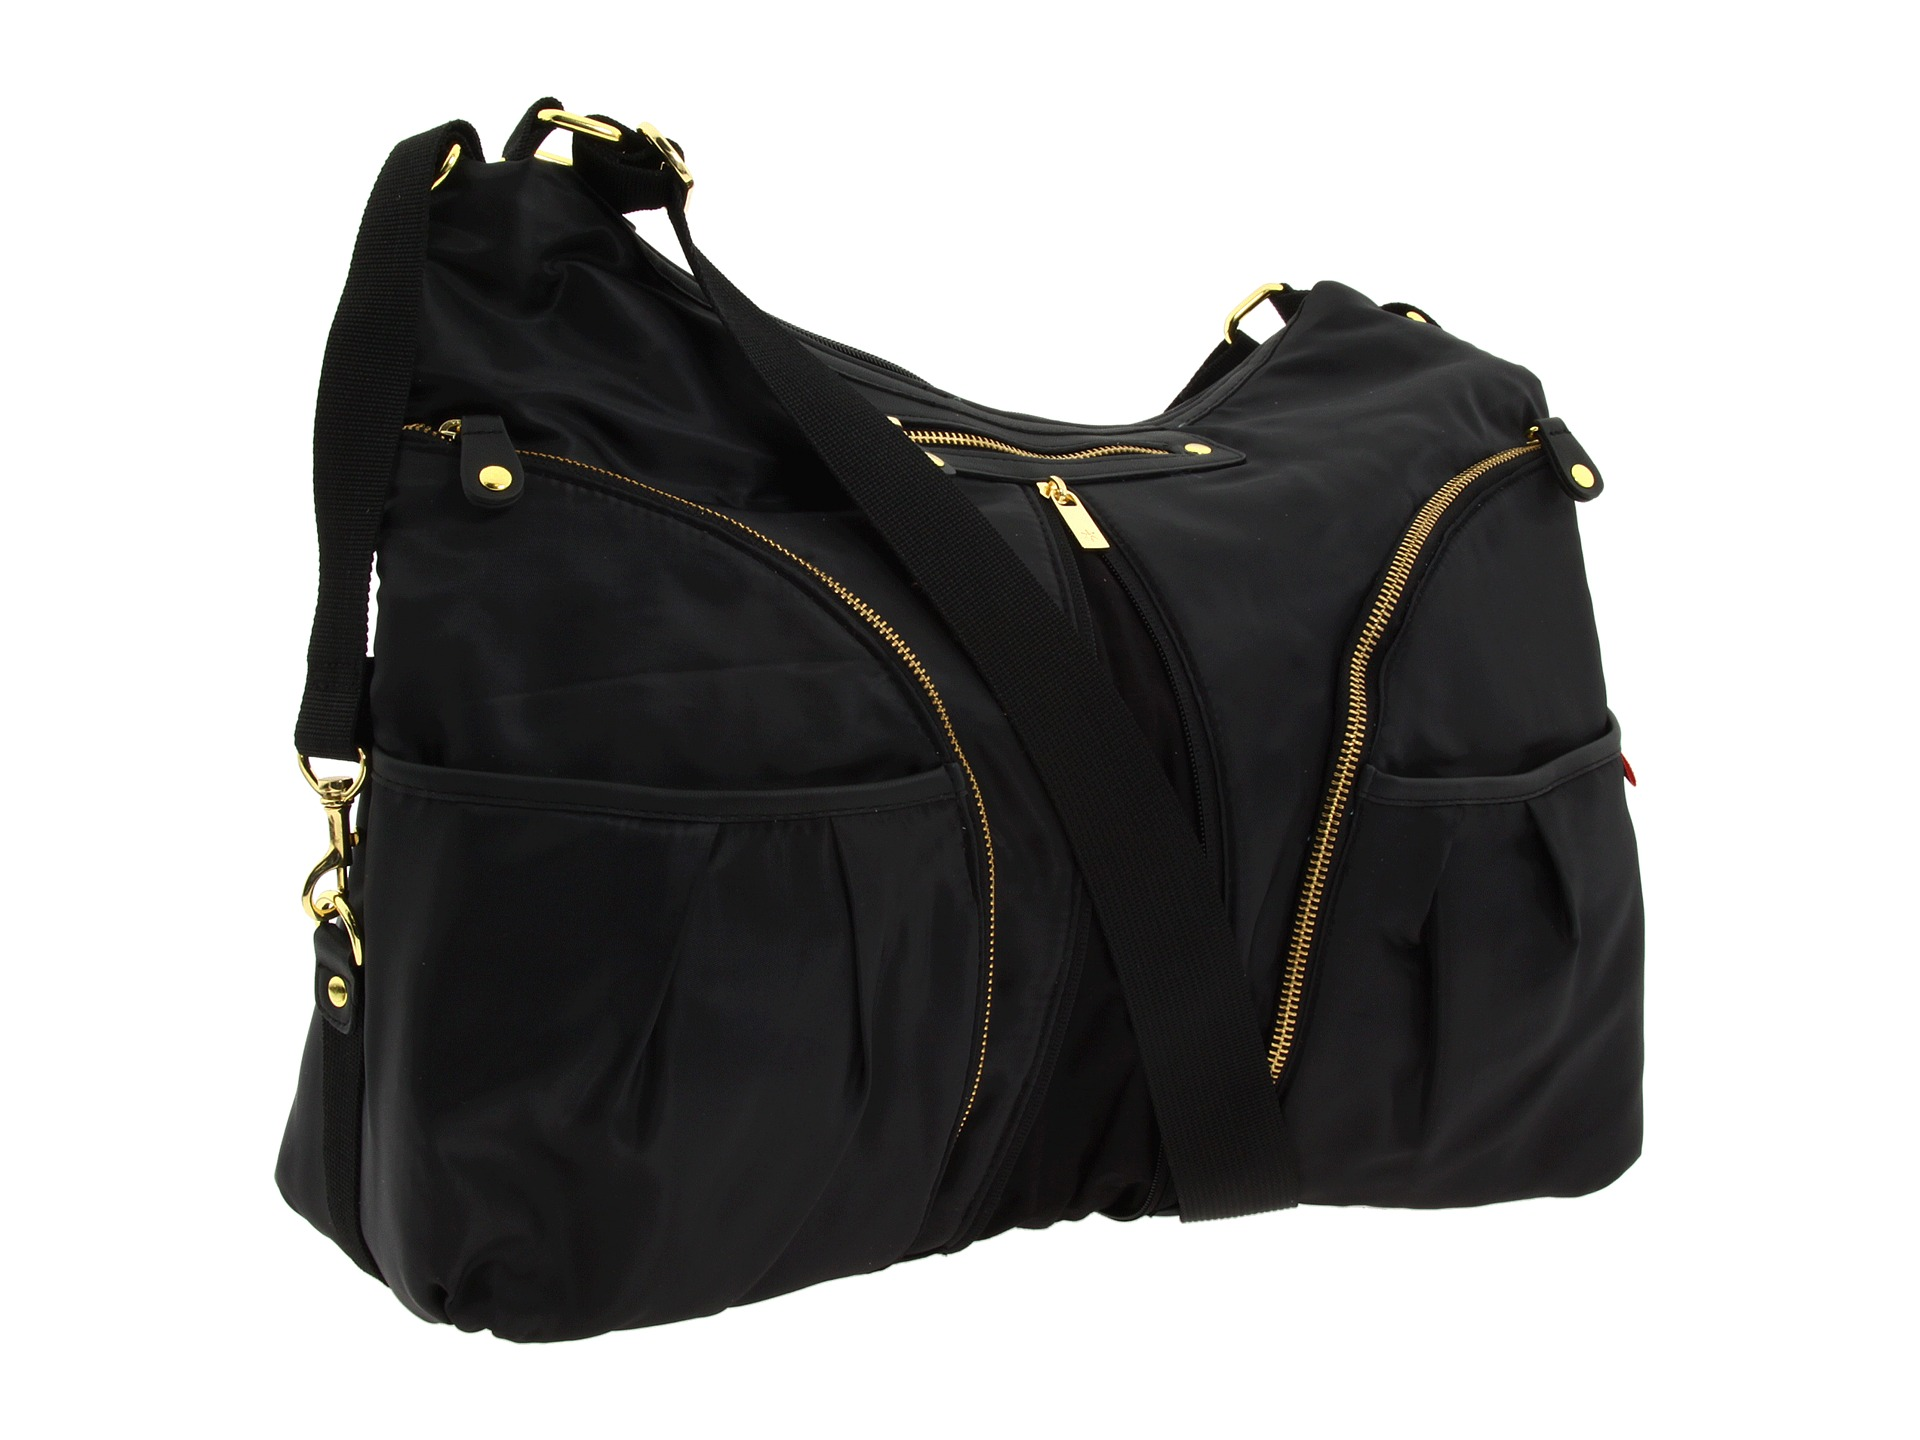 Skip Hop Versa Diaper Bag Zapposcom Free Shipping BOTH Ways